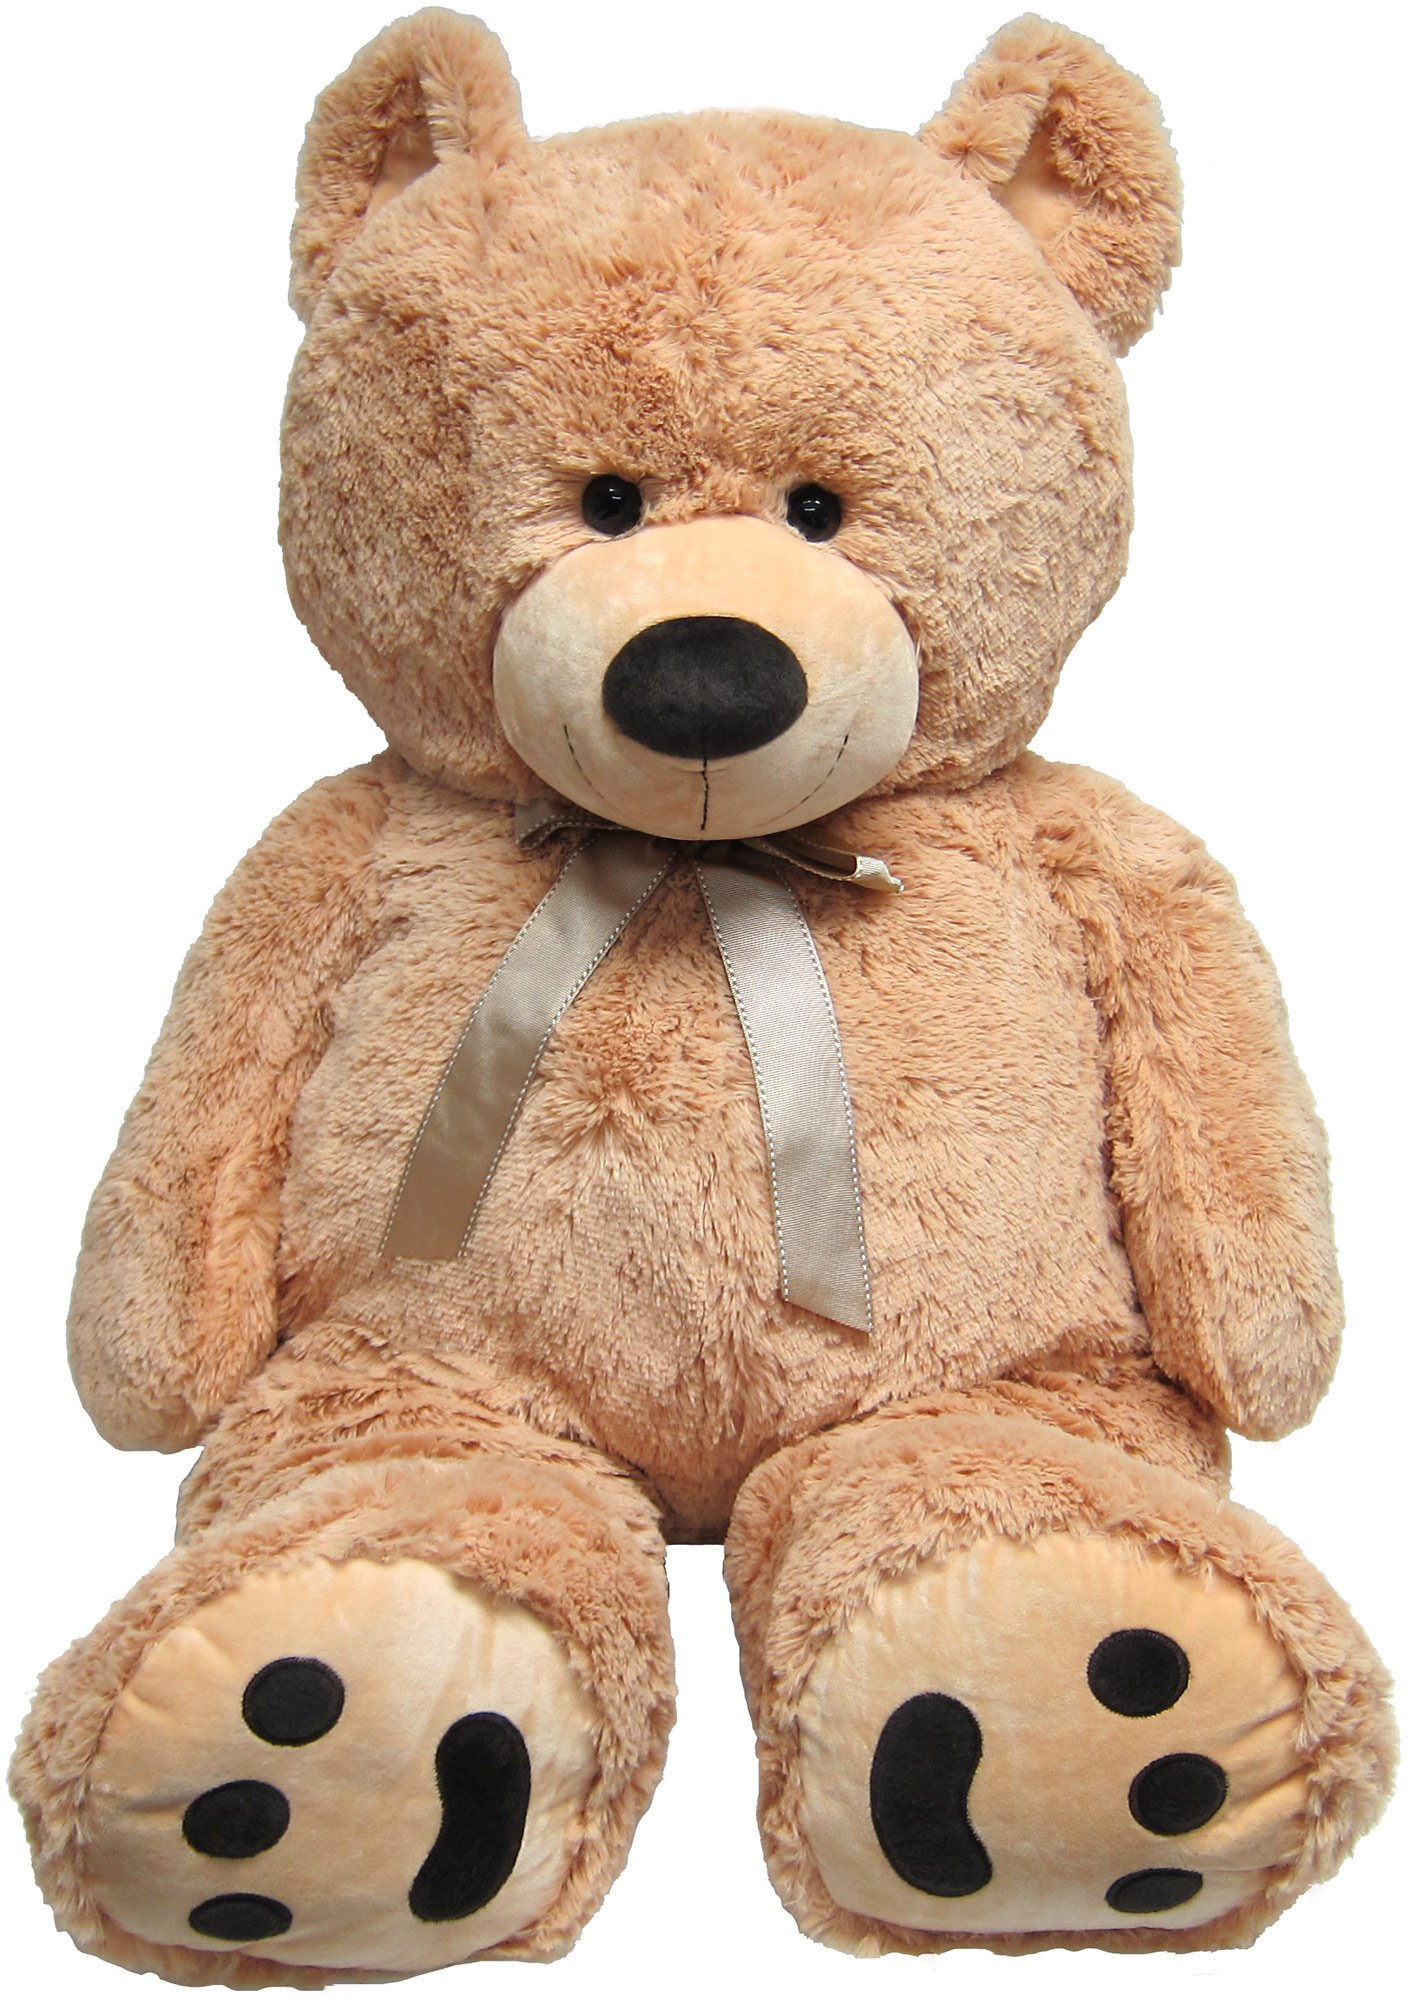 cfacea80cdc Best Rated in Stuffed Animals   Teddy Bears   Helpful Customer ...